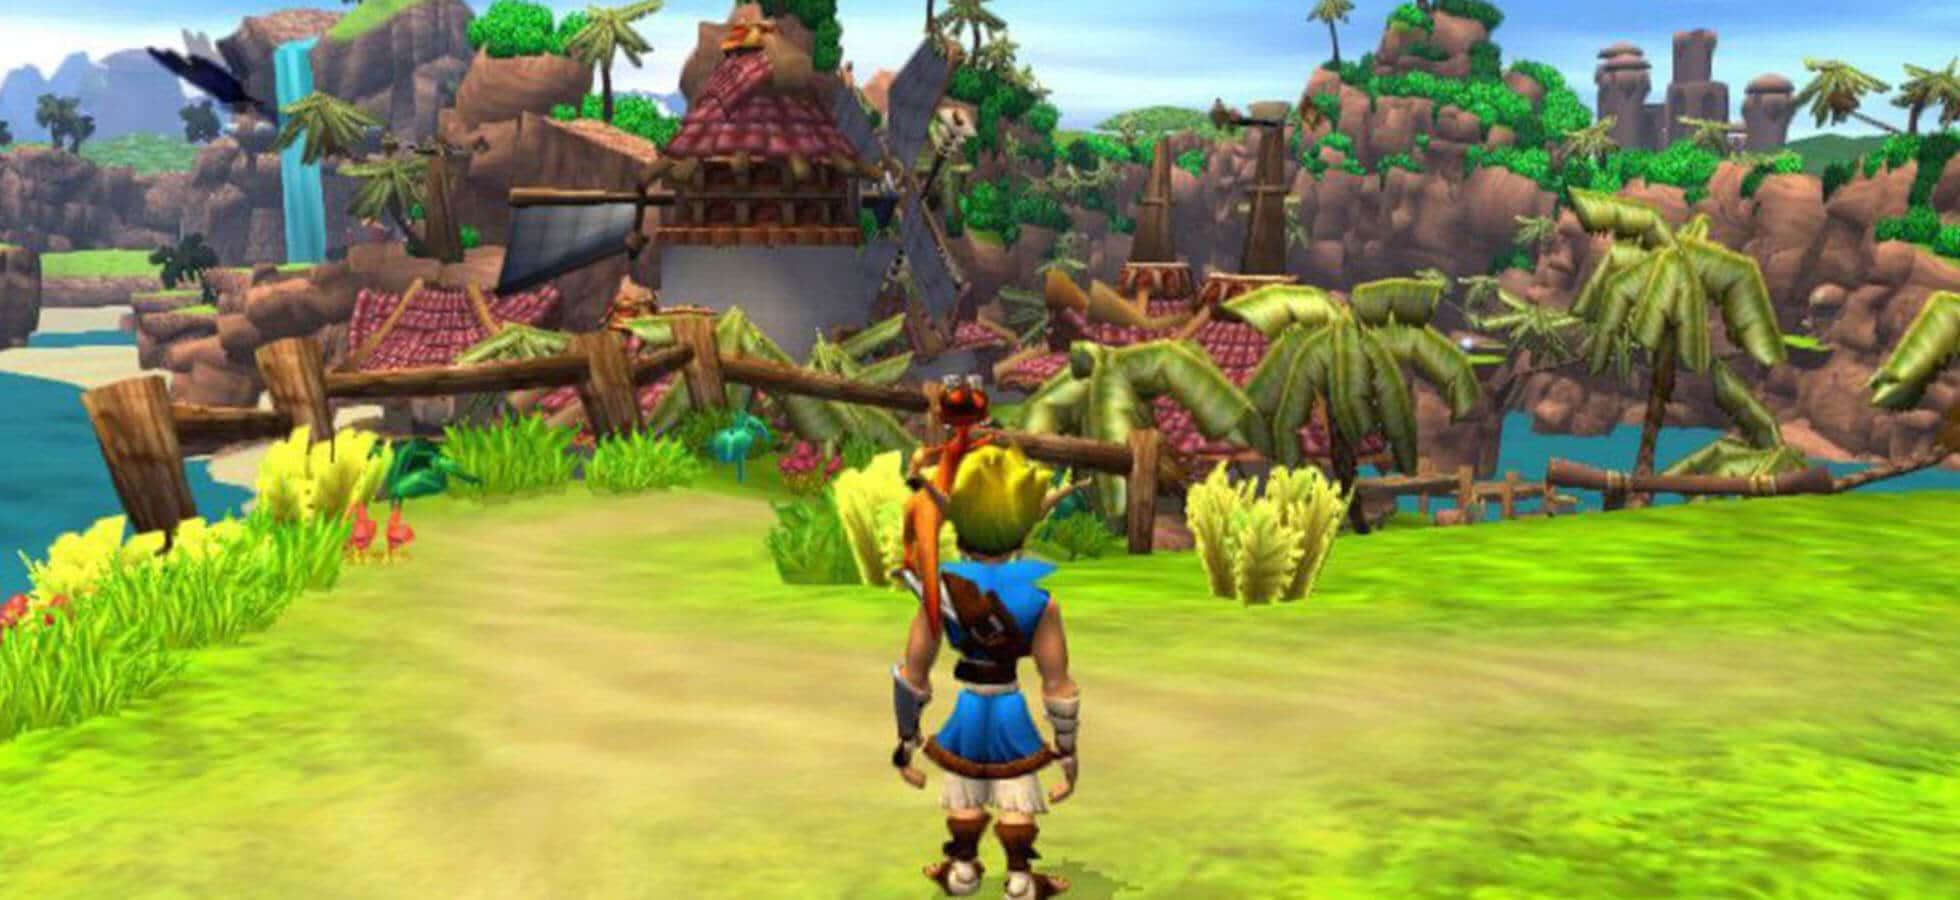 Jak & Daxter: The Precursor Legacy - PlayStation 3